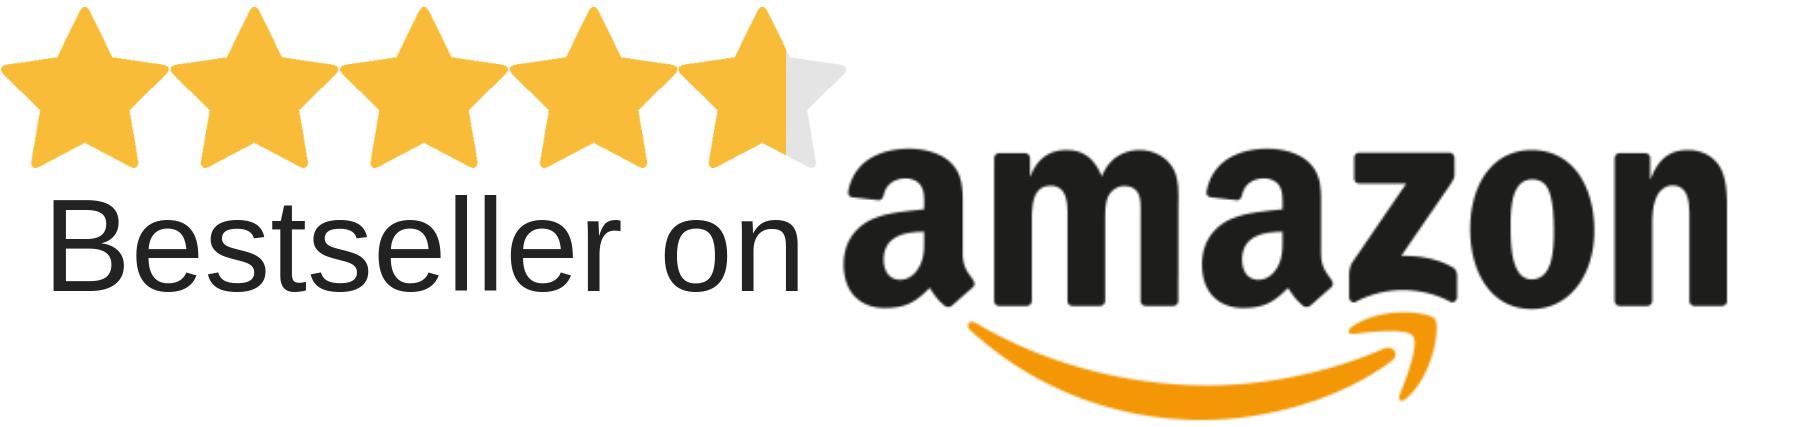 Amazon Bestseller Image for Website(3).png